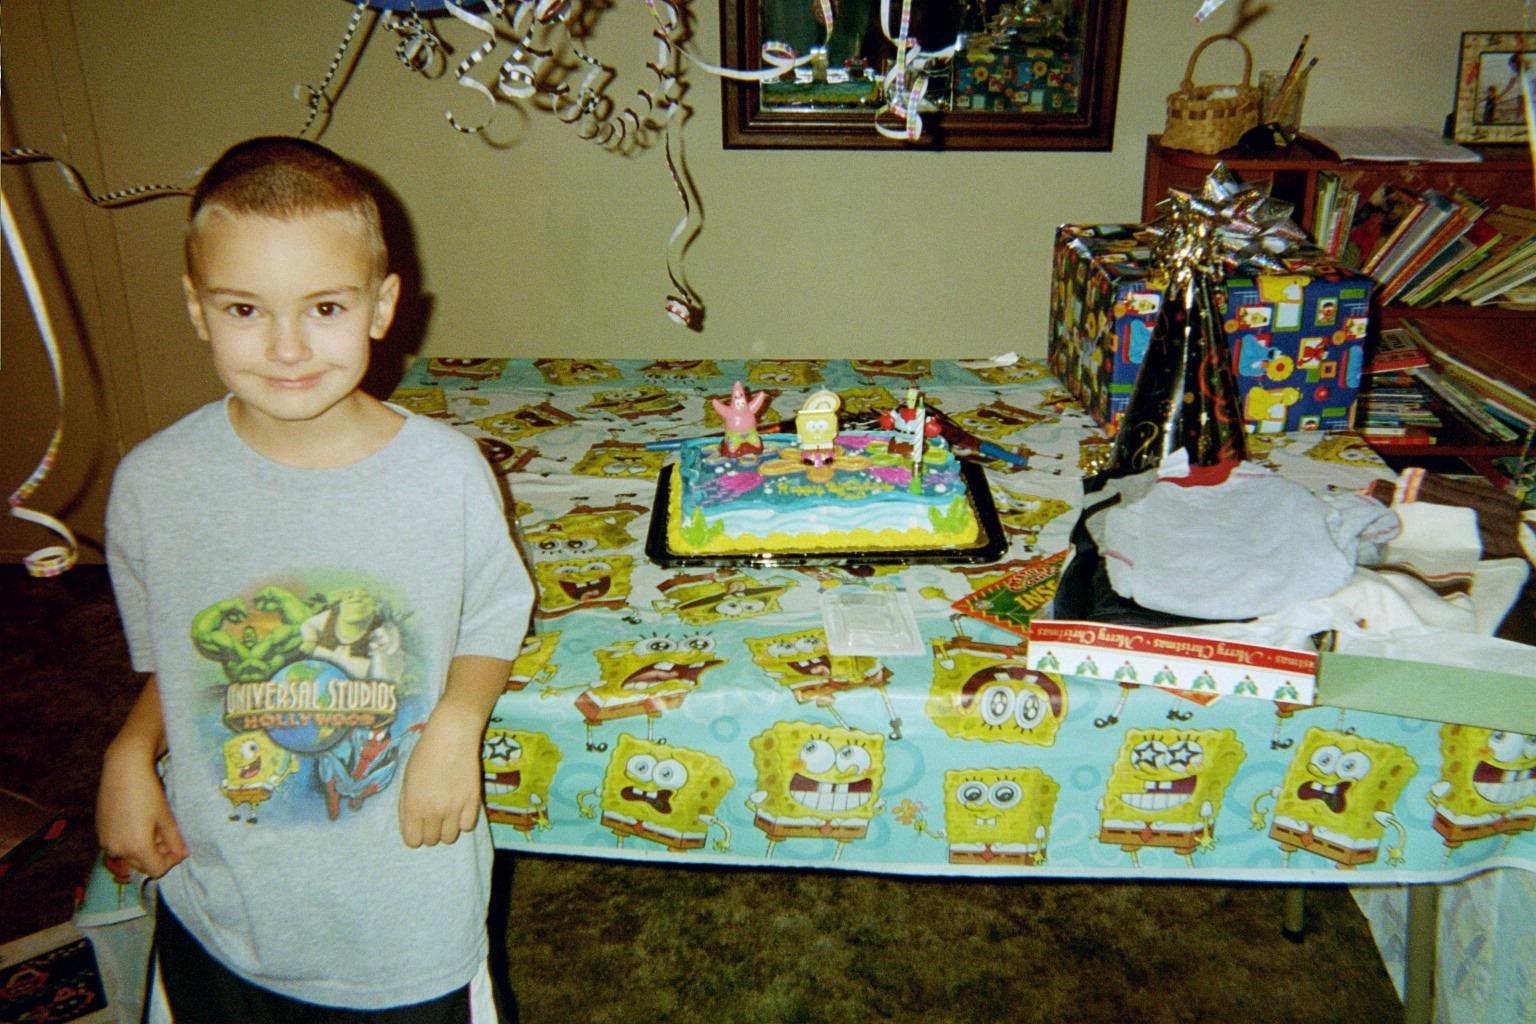 Grandson Paul's recent birthday party